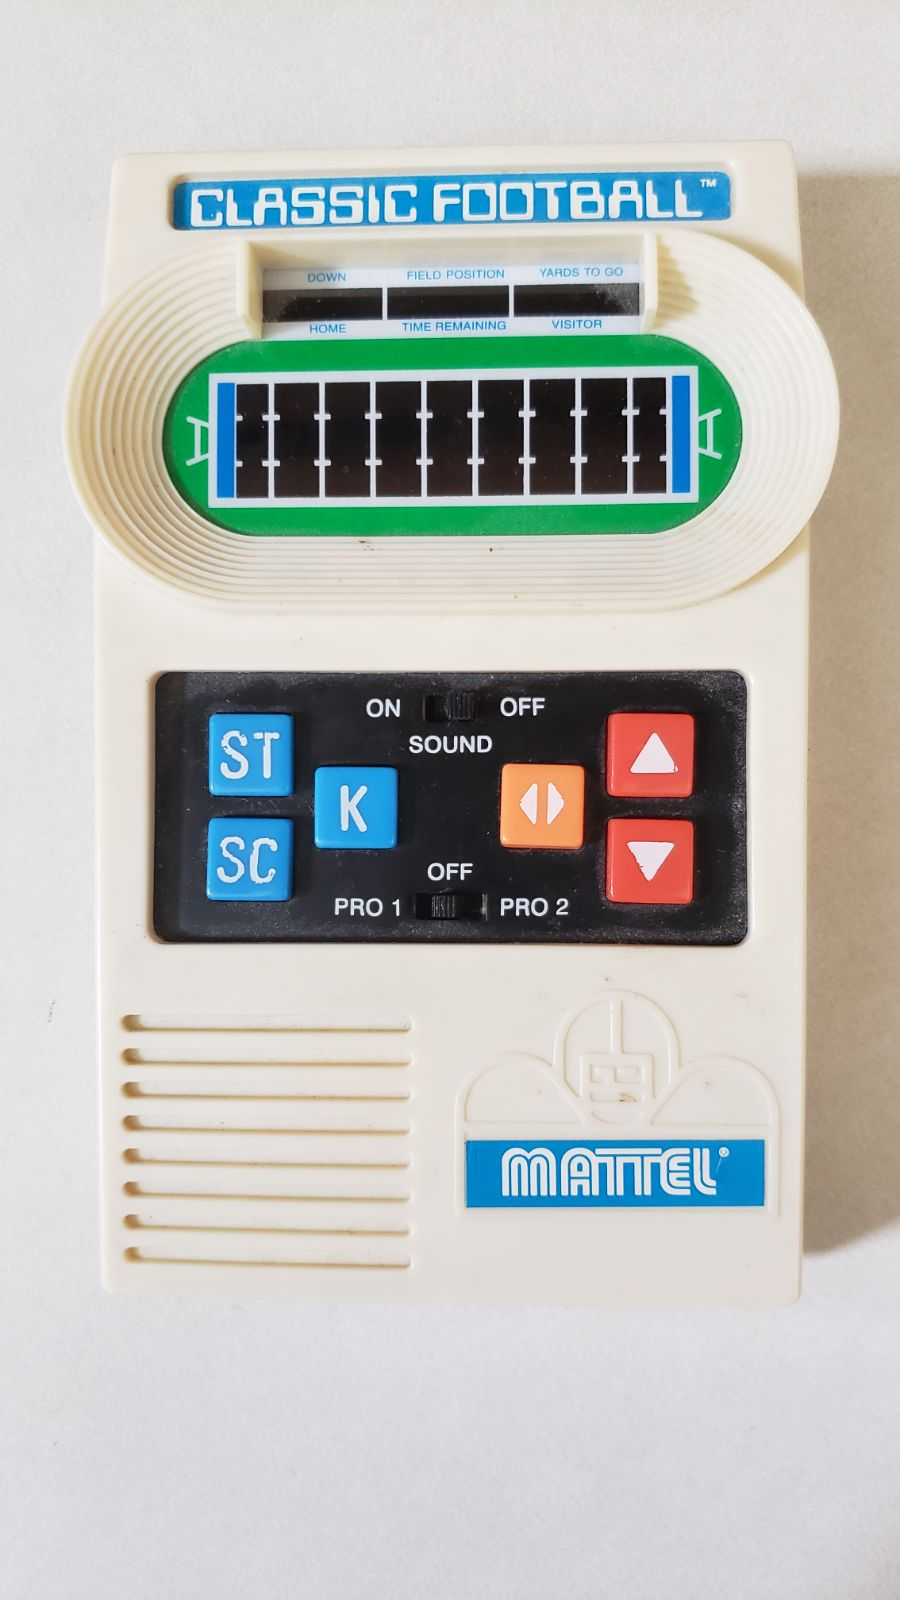 Classic Football Mattel